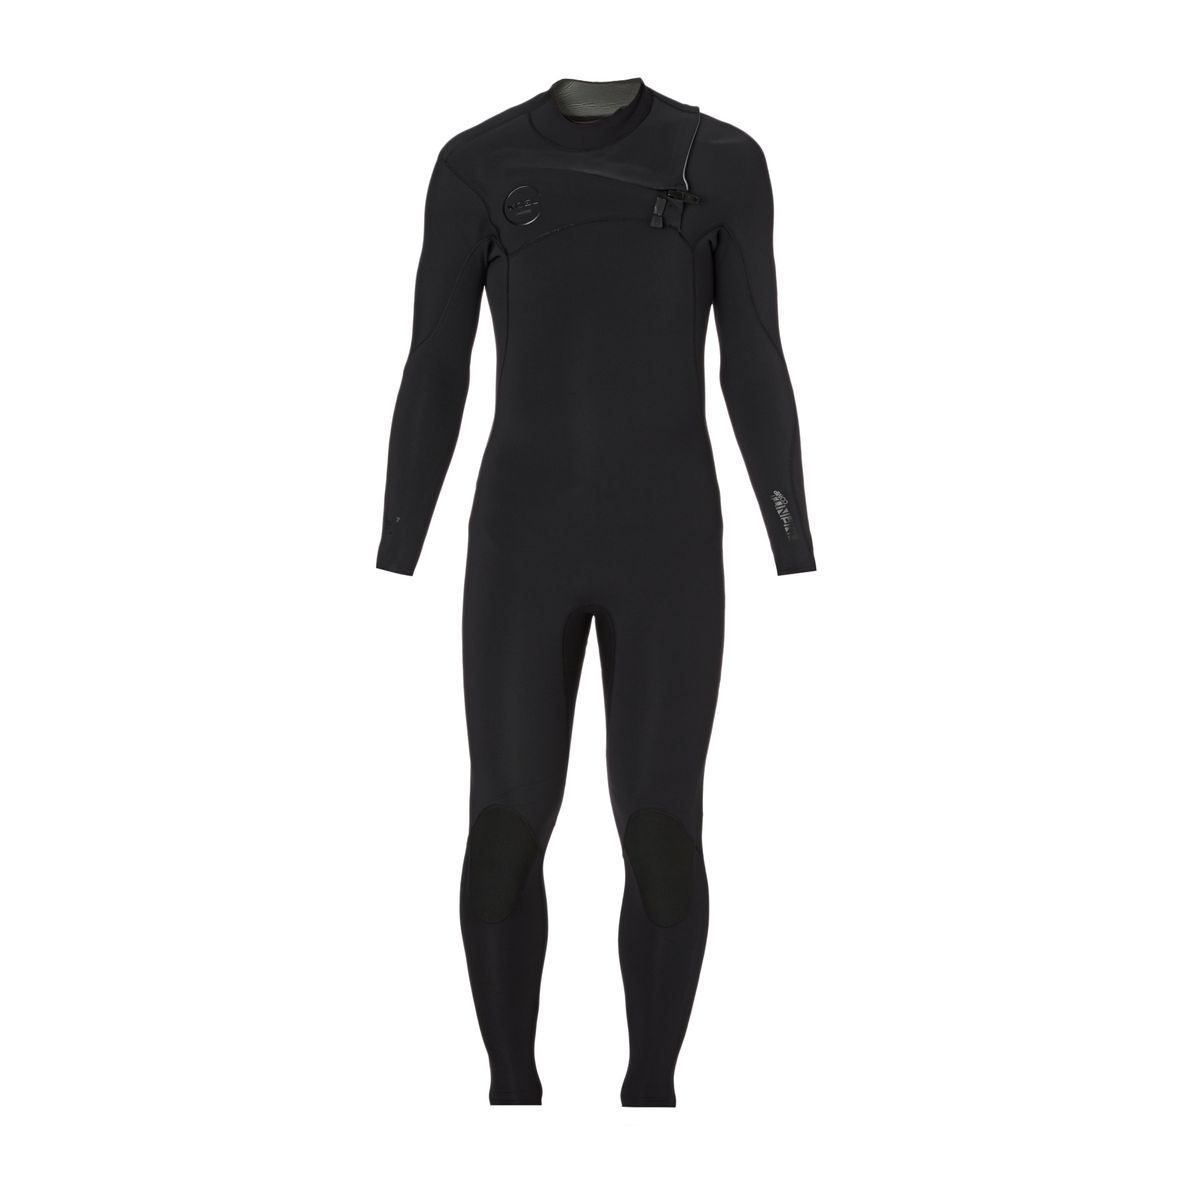 Xcel Infiniti Comp TDC 4/3mm 2017 Chest Zip Wetsuit - Black